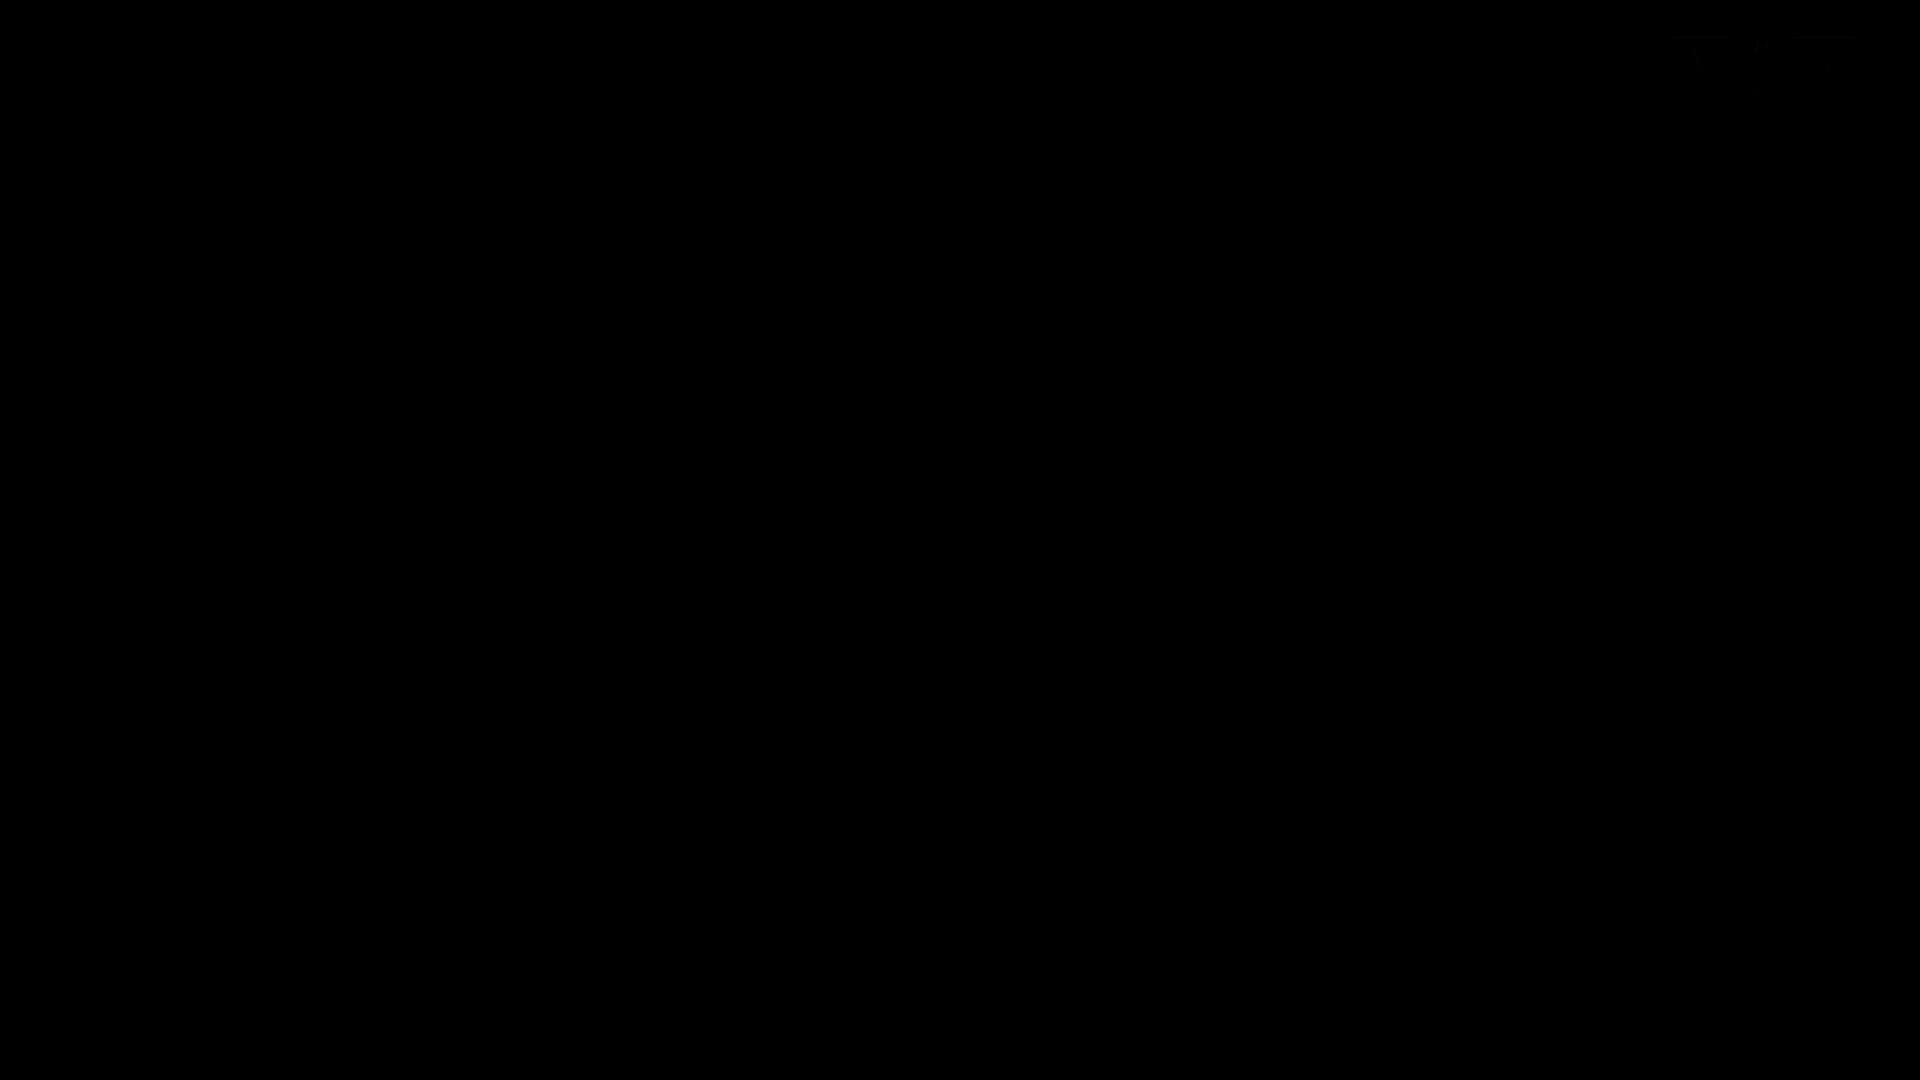 JD盗撮 美女の洗面所の秘密 Vol.53 ギャル達 オマンコ動画キャプチャ 99枚 24